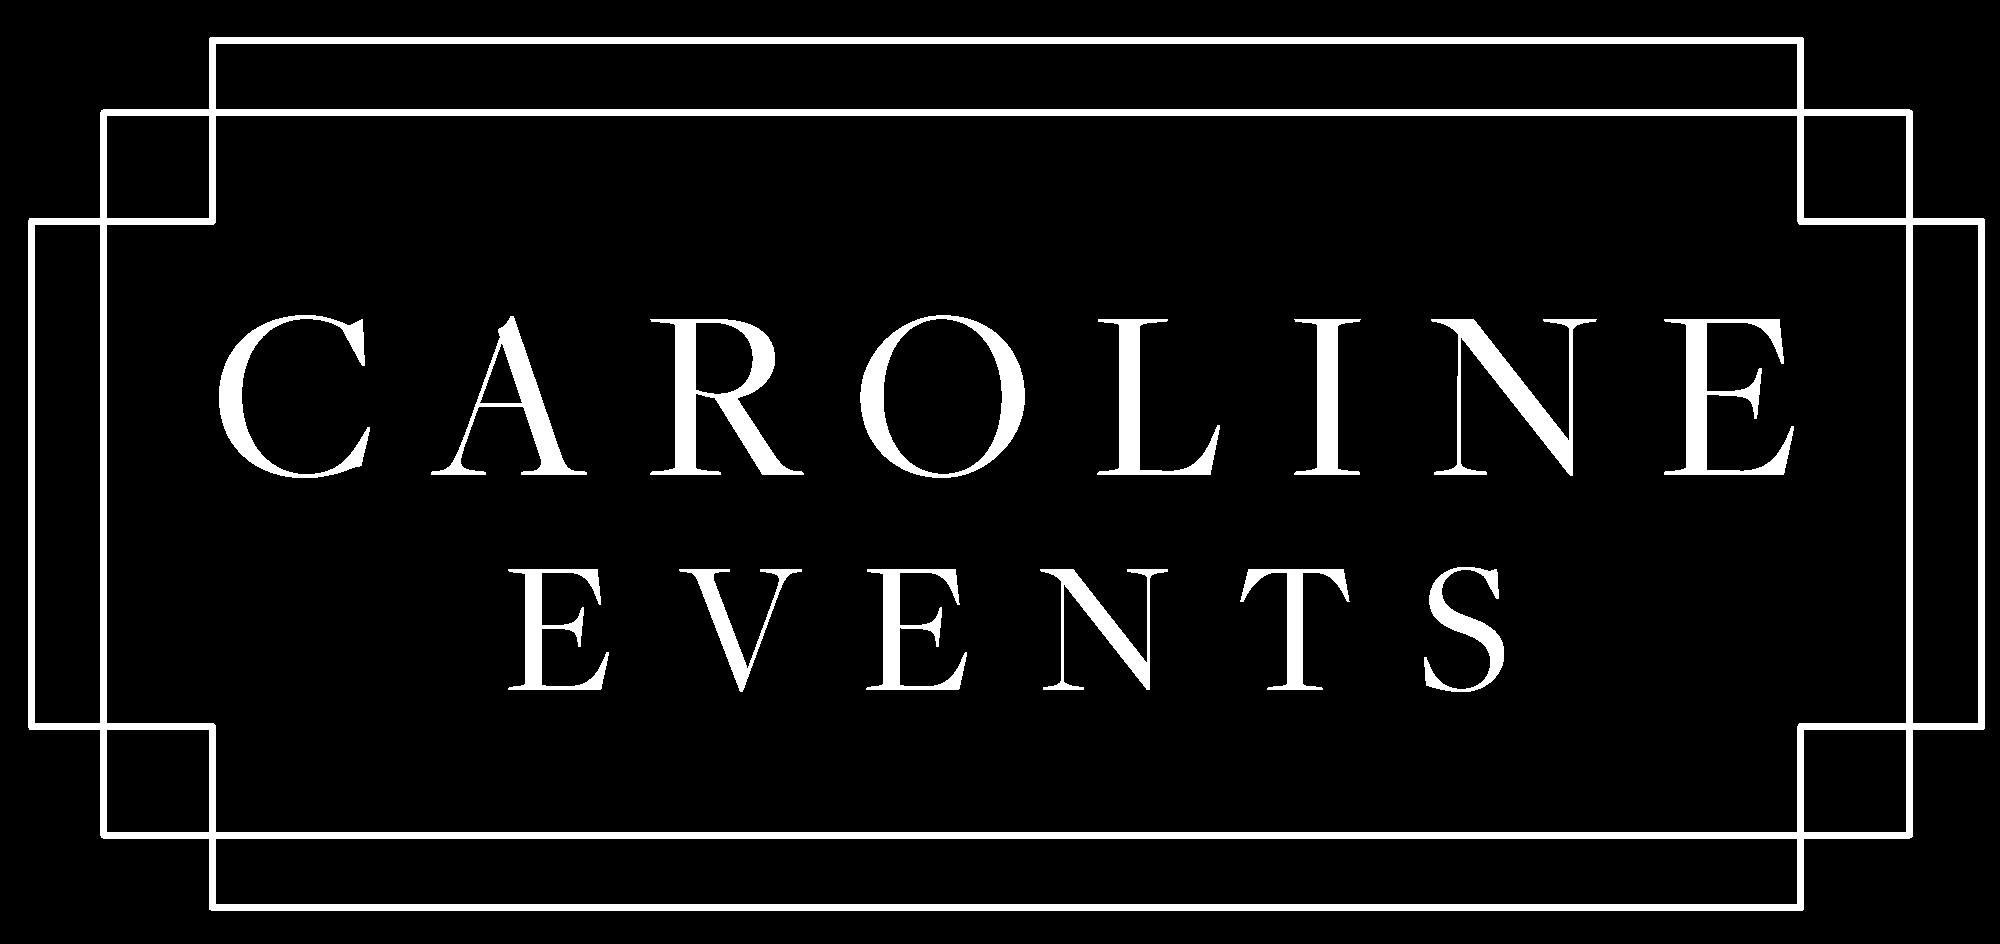 CarolineEvents_logo_main_white.png